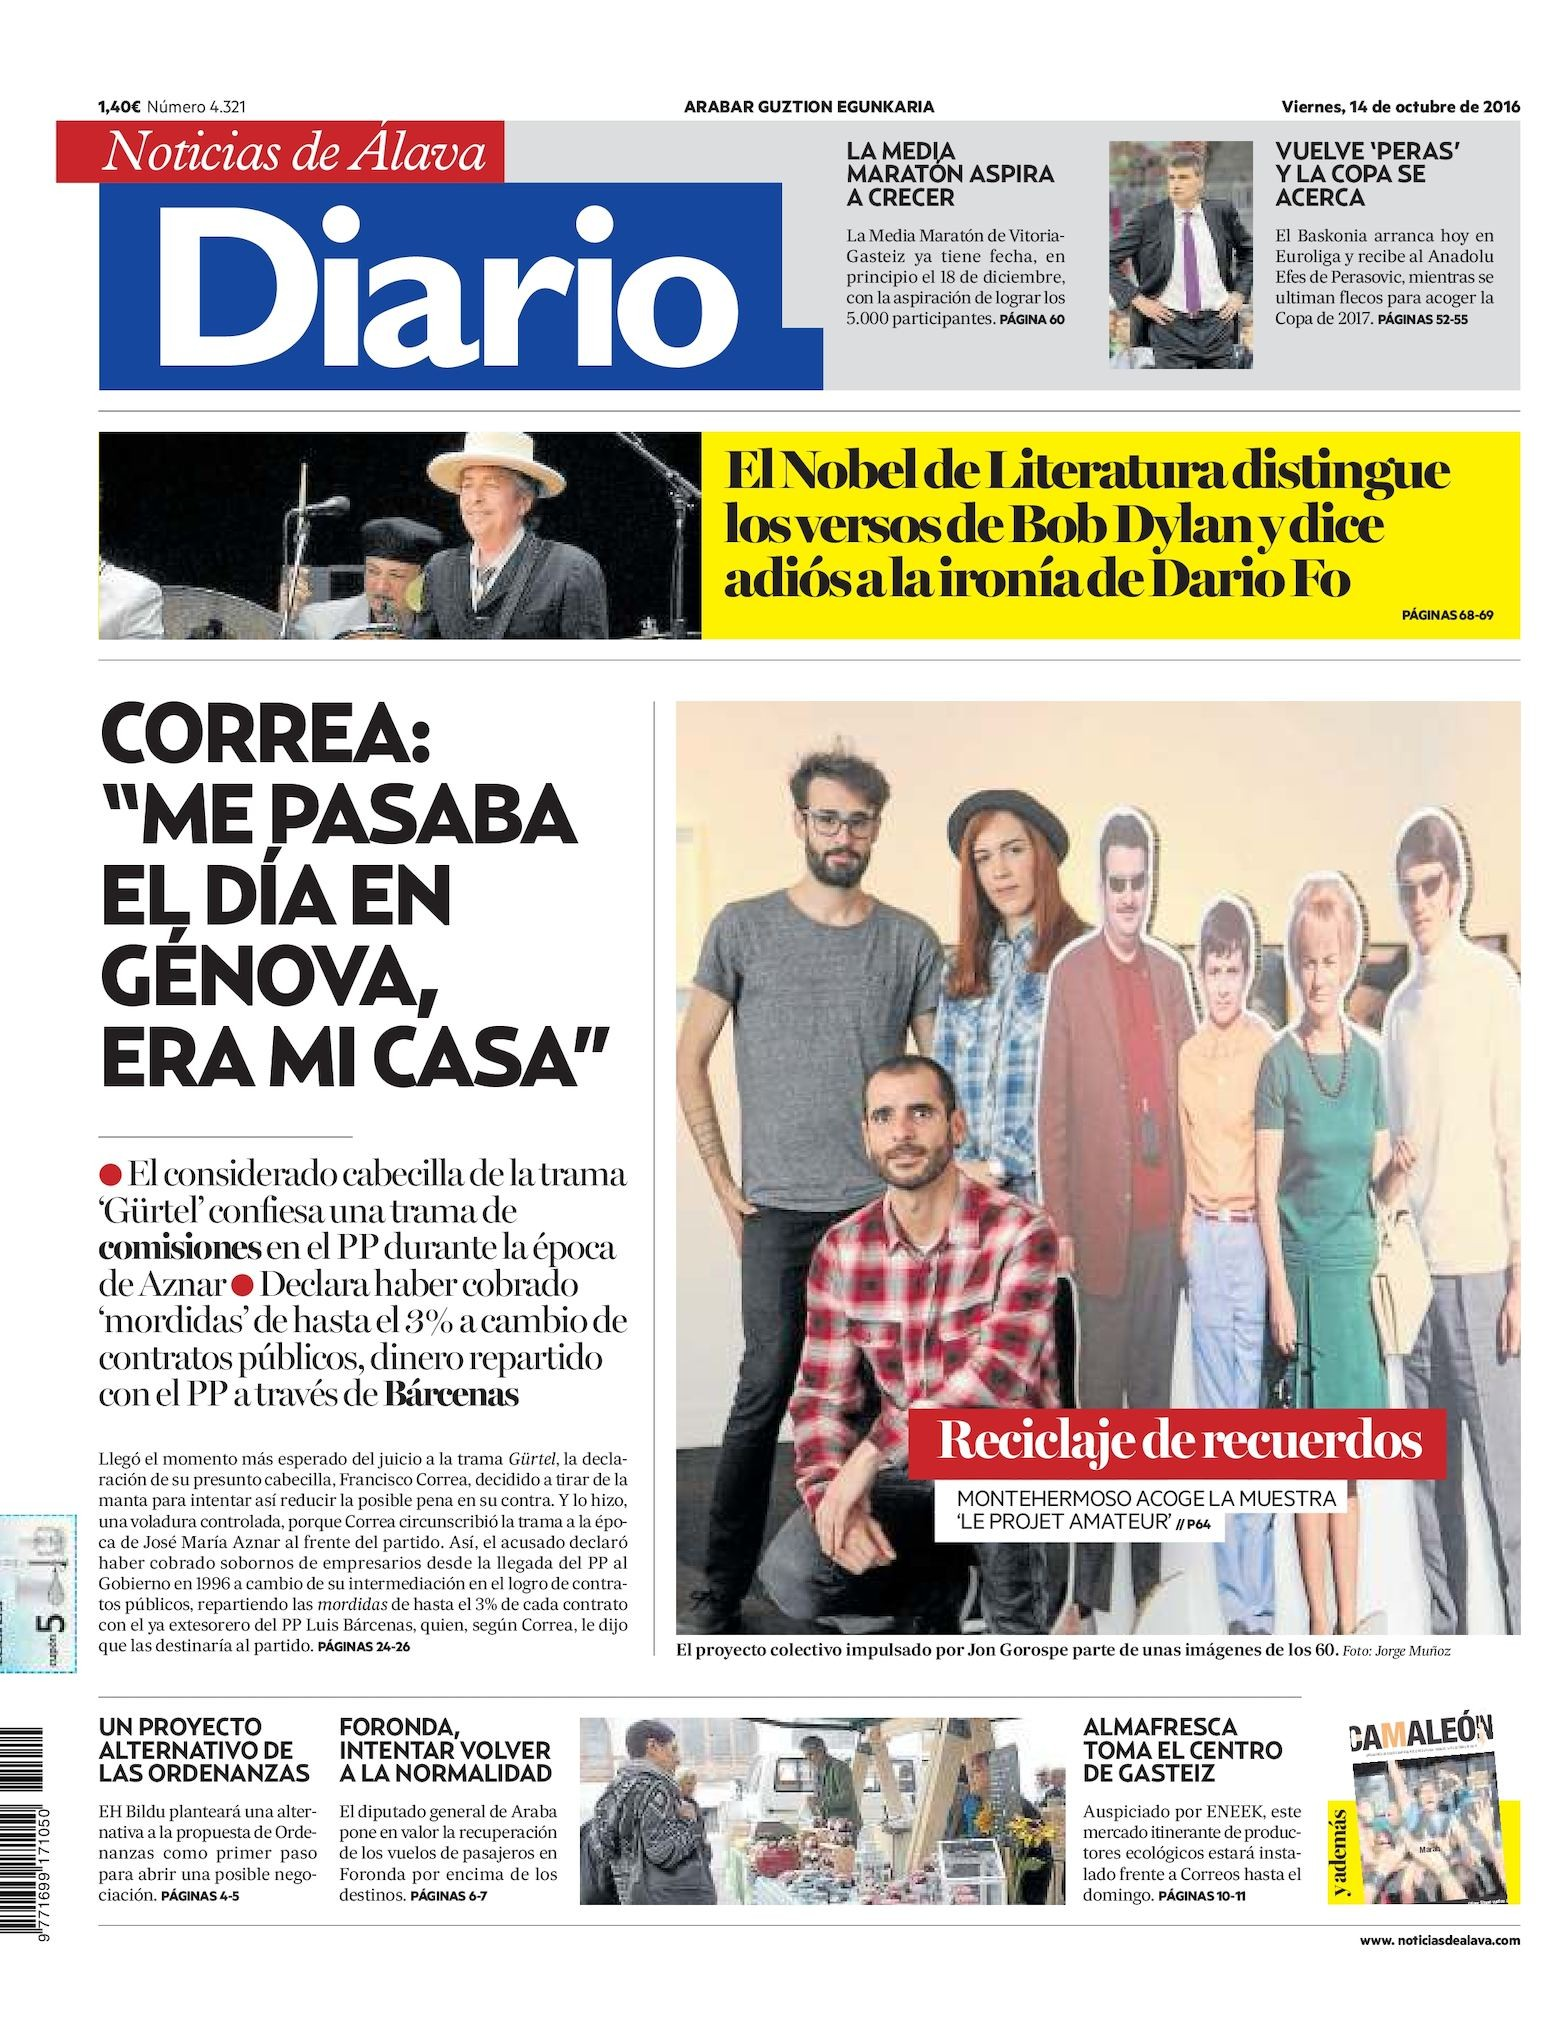 Calendario Escolar 2019 19 Canarias Para Imprimir Más Caliente Calaméo Diario De Noticias De lava Of Calendario Escolar 2019 19 Canarias Para Imprimir Más Caliente 10 06 15 Em Pdf